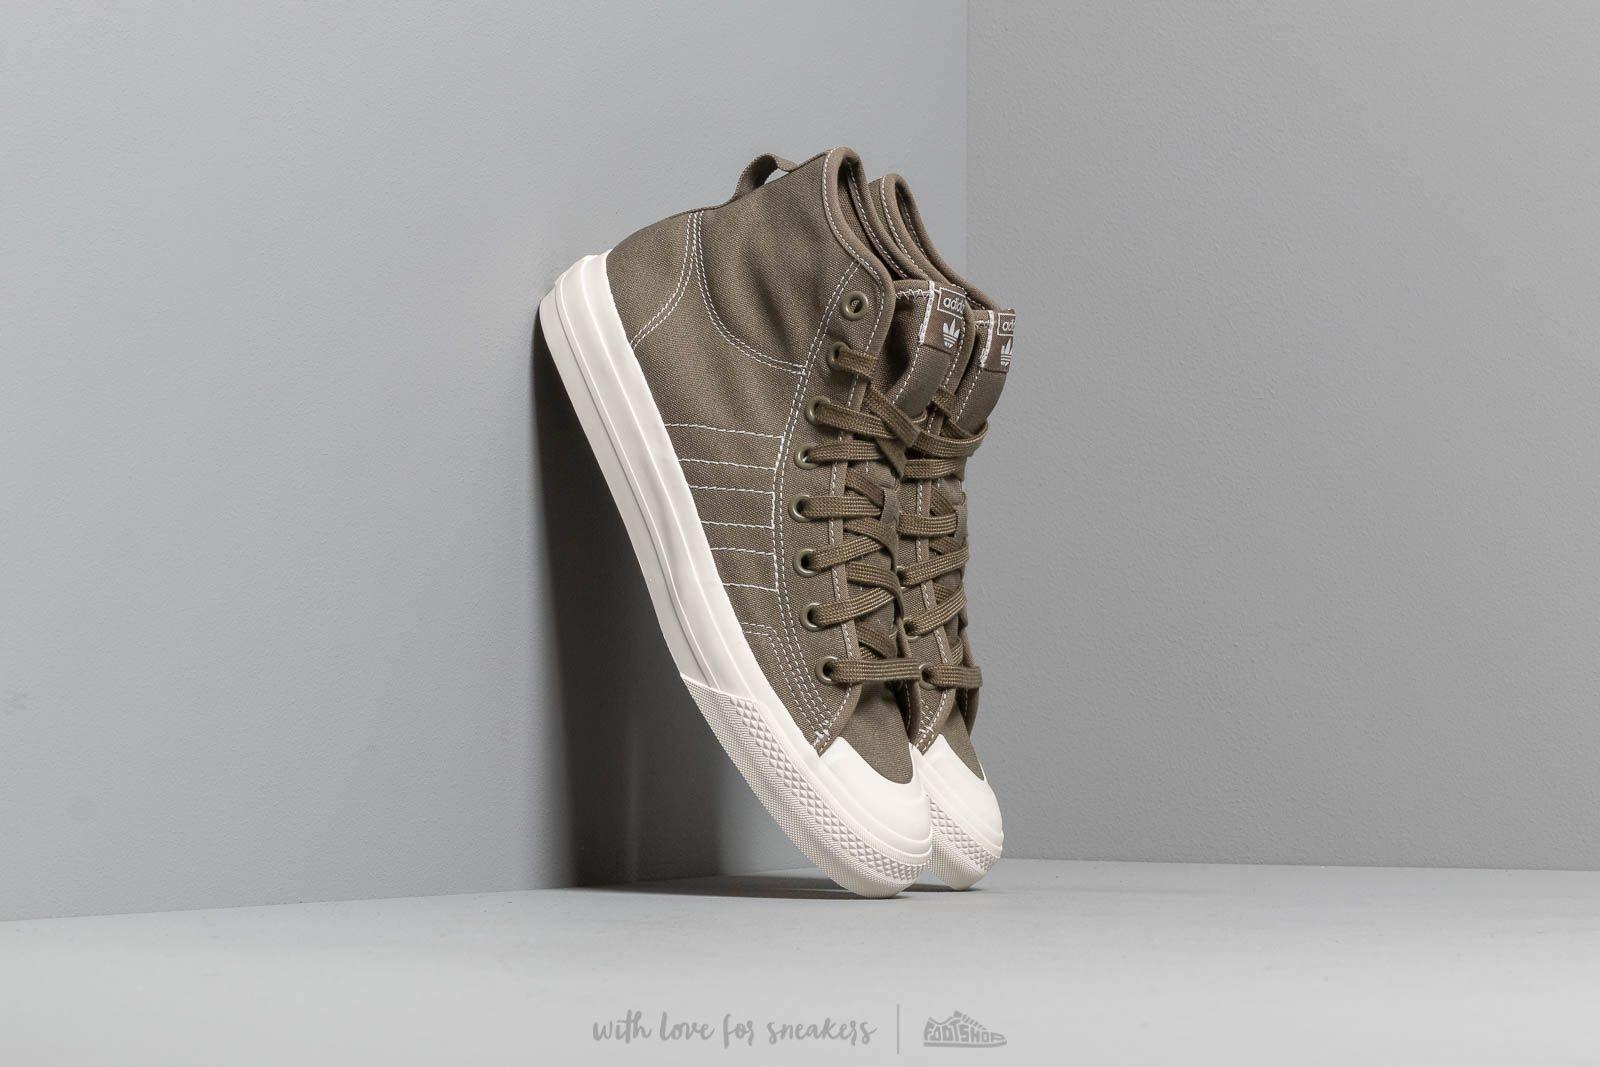 b678b6210d14 adidas Nizza Hi Rf Rawkha/ Off White/ Off White at a great price 2